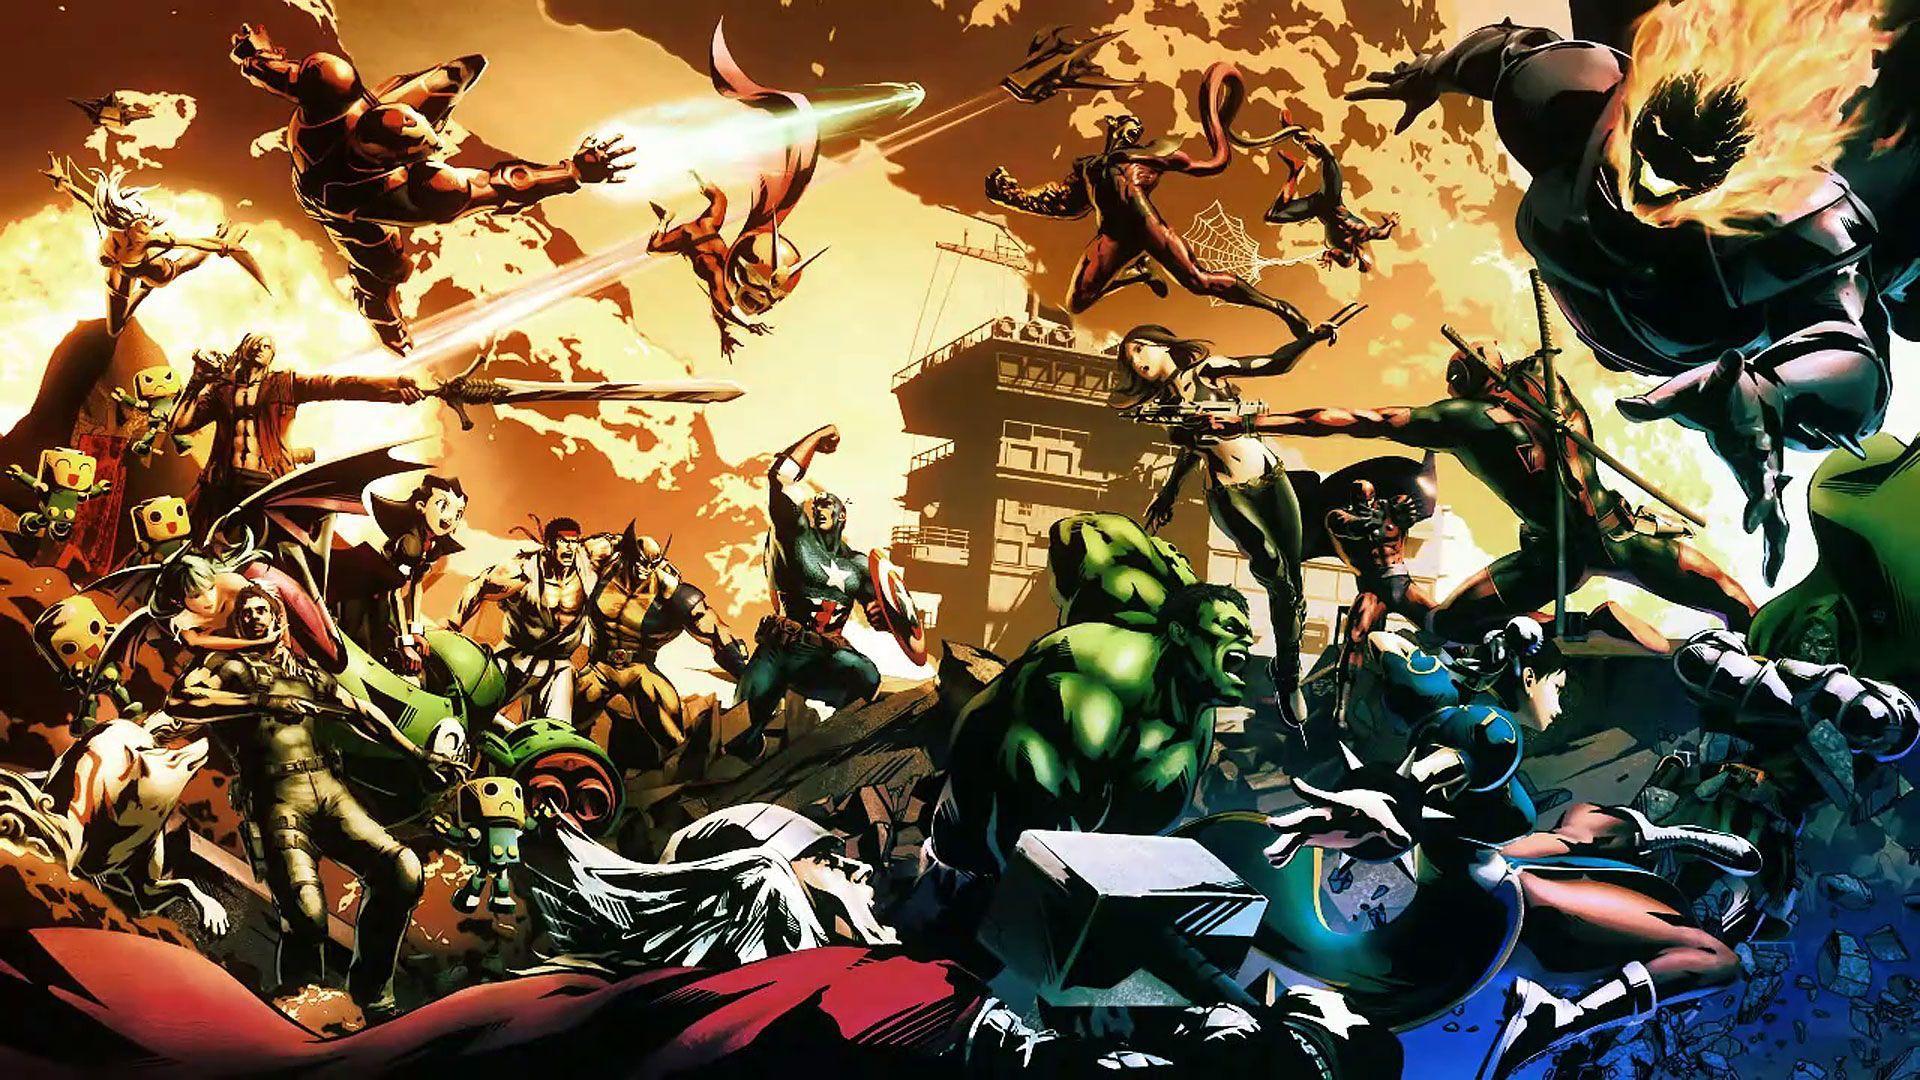 Ultimate Marvel Vs Capcom 3 Usa Ps3 Iso Download Free List Of Best Mods Papel De Parede Marvel Papeis De Parede De Jogos Hd Game Art